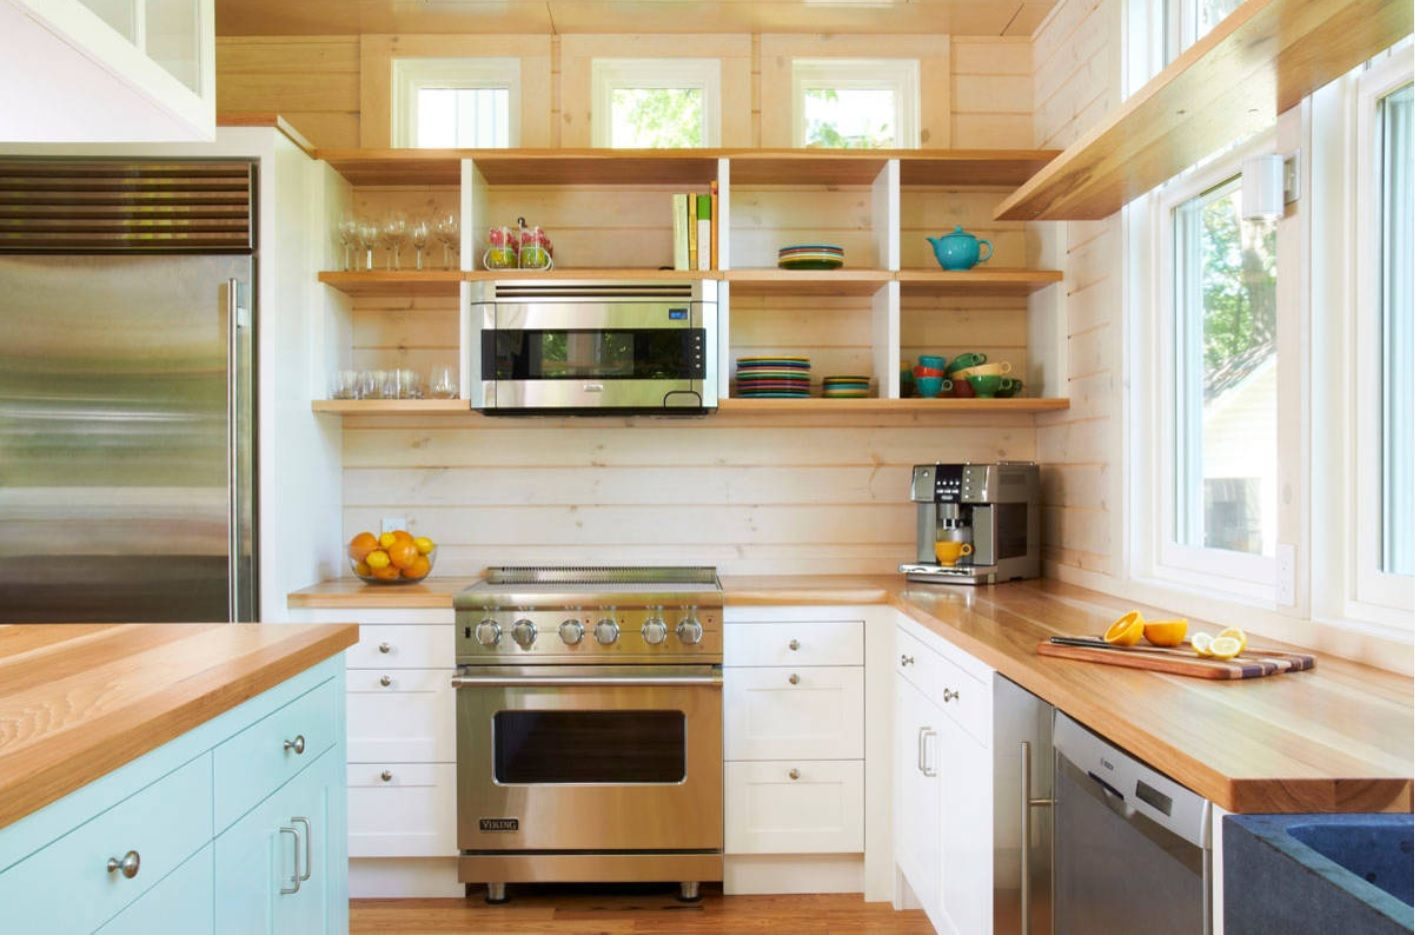 Butcher Block Countertop in Modern Kitchen Interior. Minimalistic Casual interior with open top storage systems